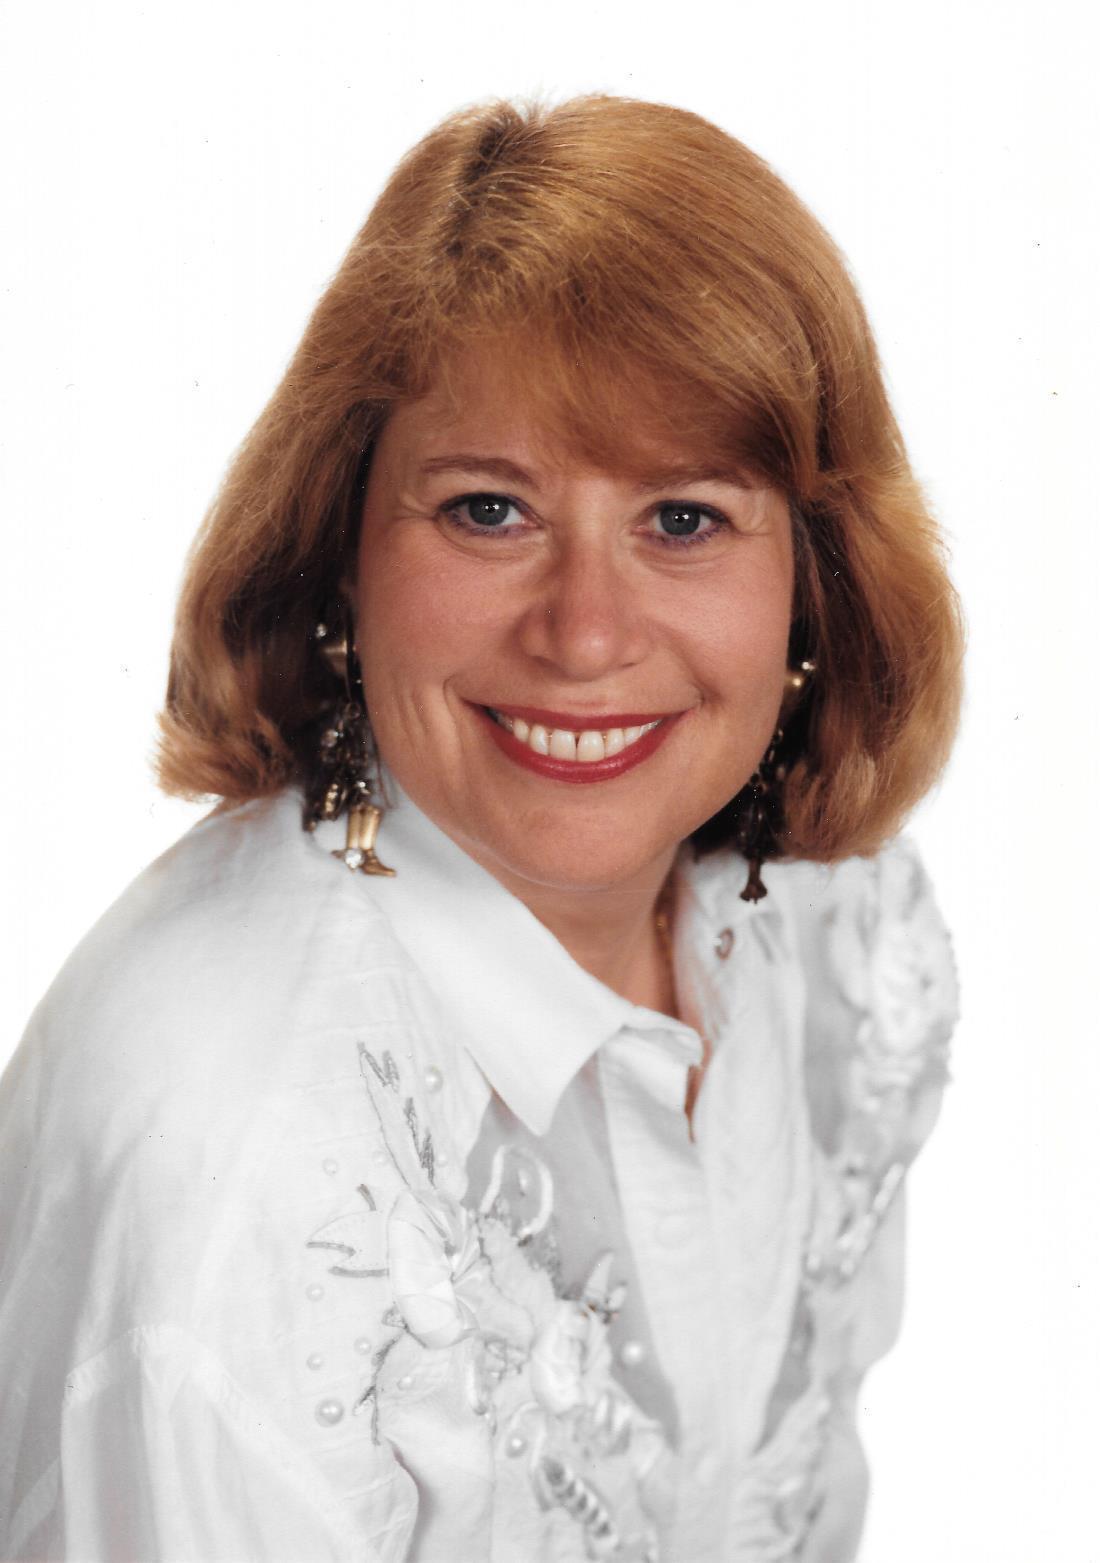 Charlene Schnall